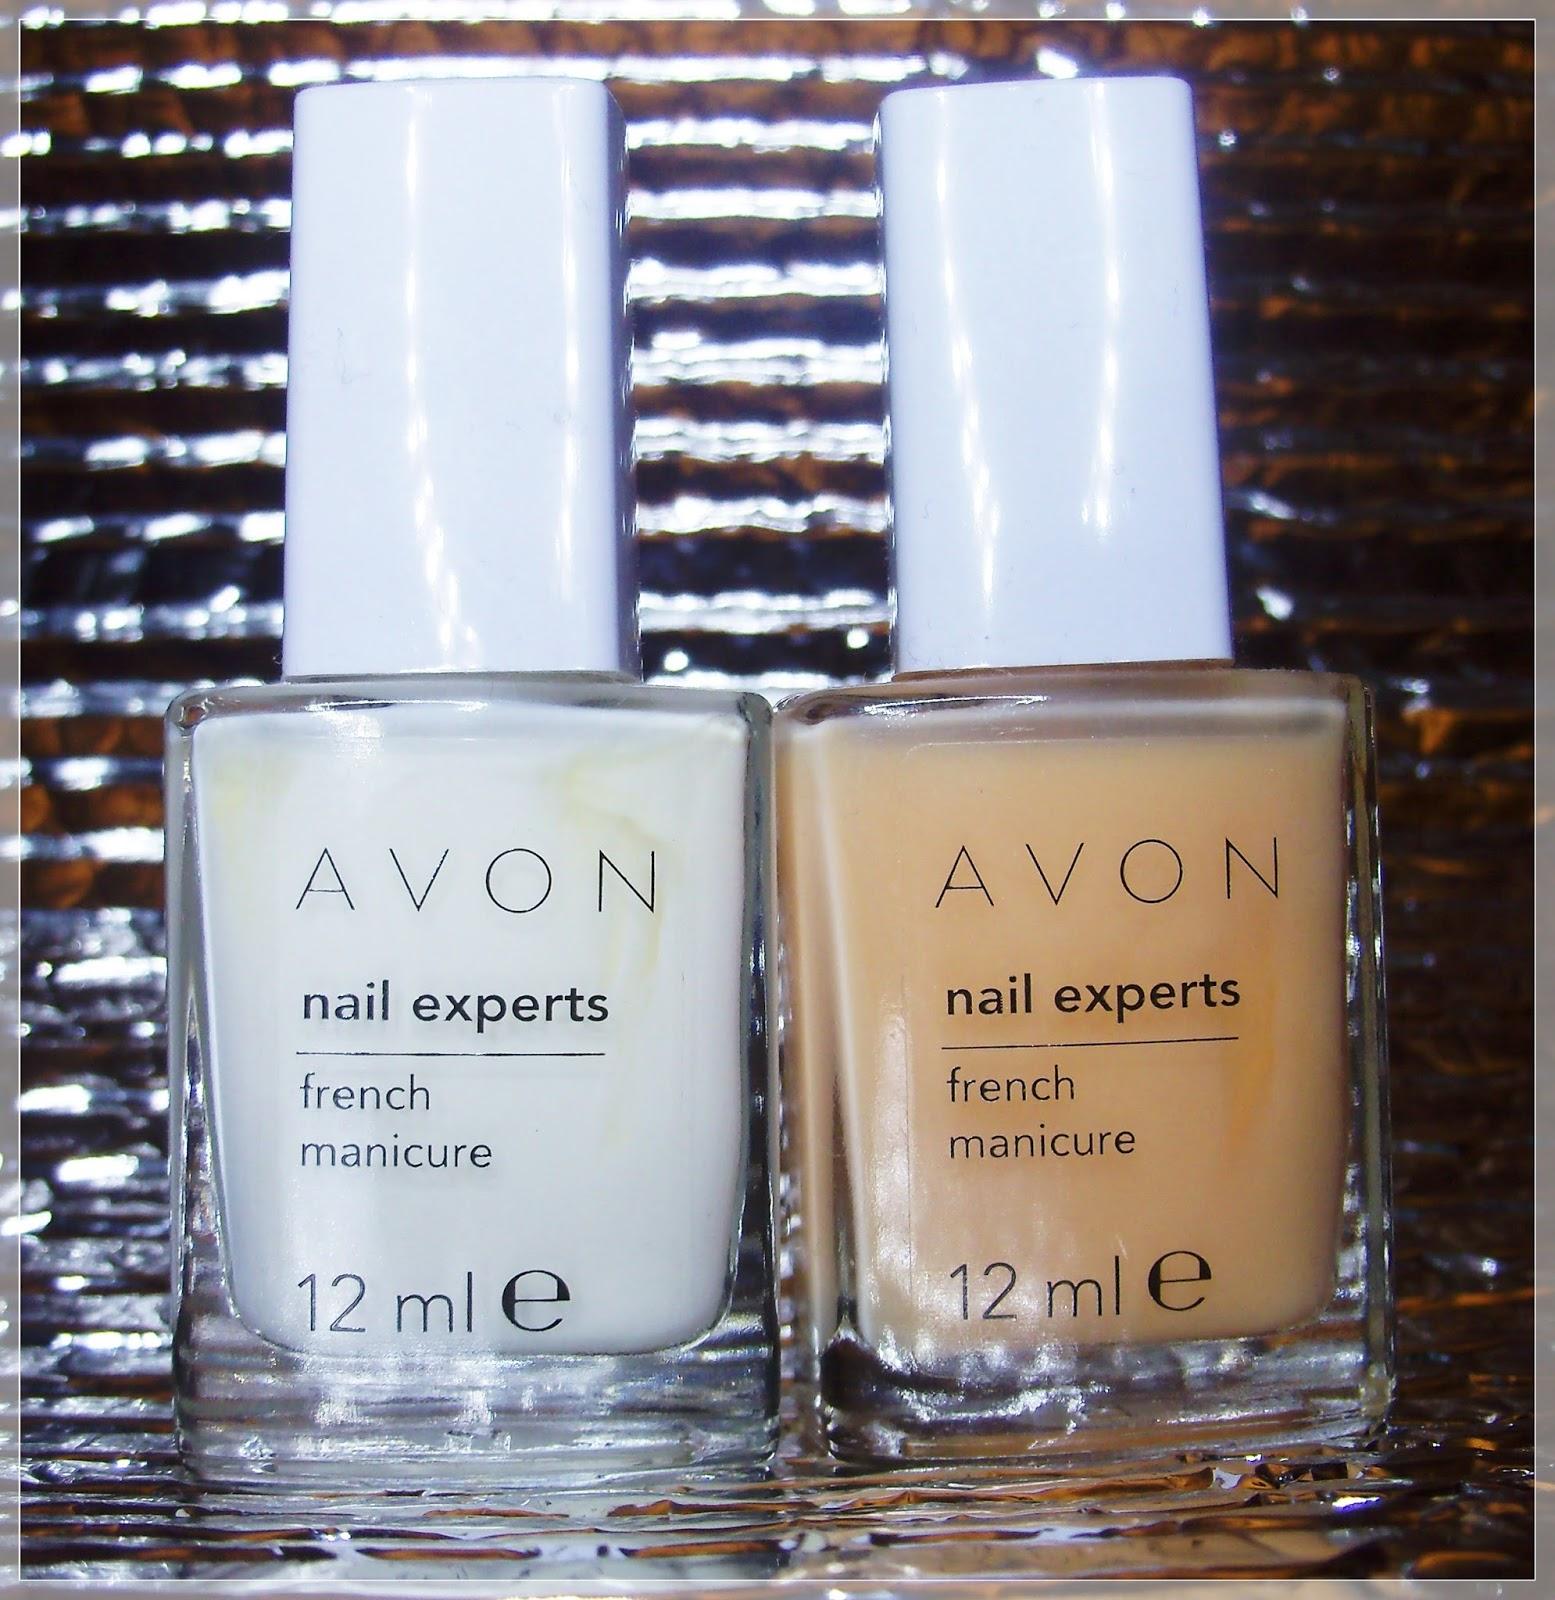 AVON NAIL EXPERTS